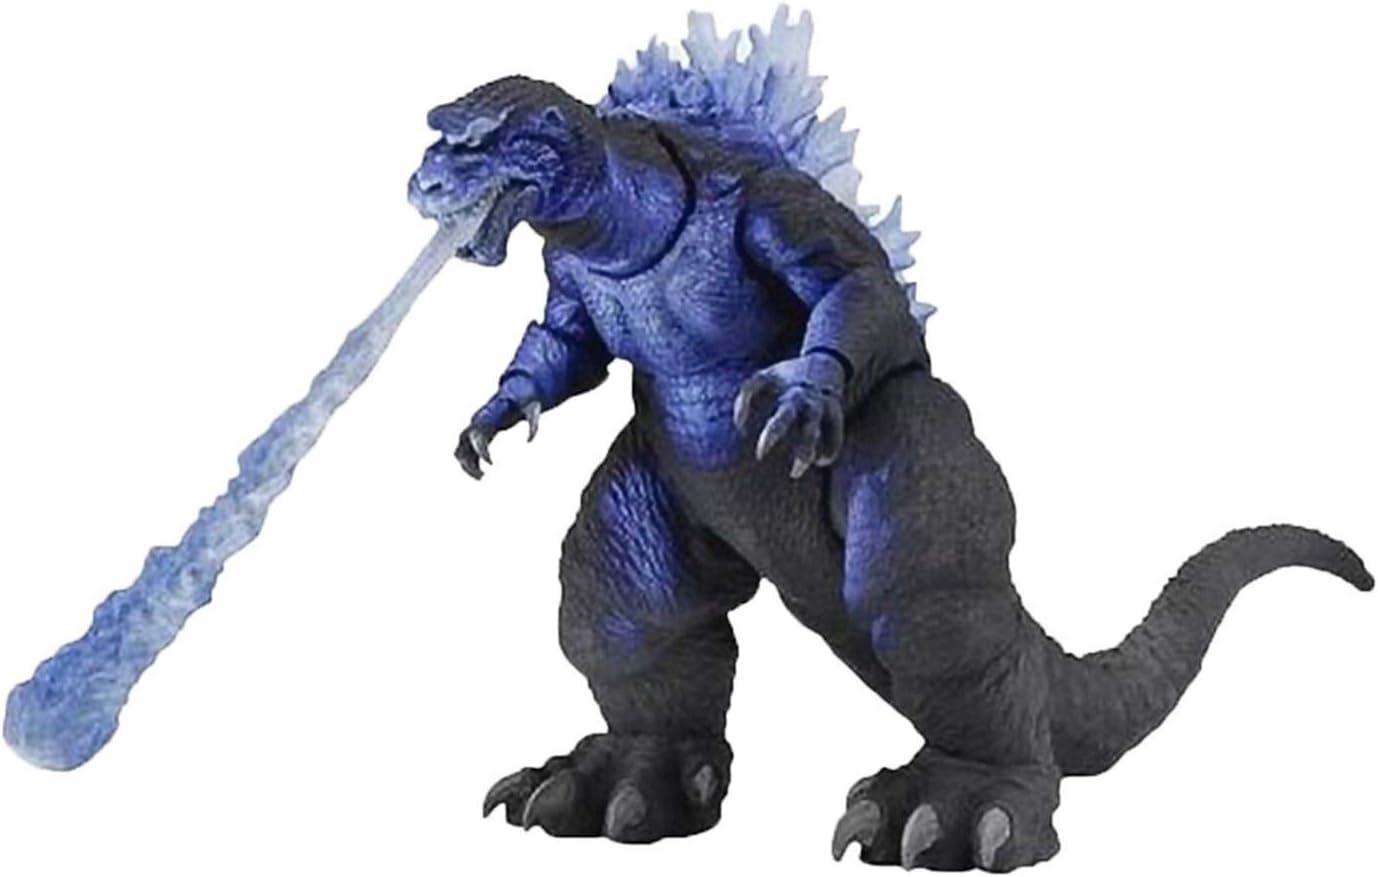 Huanghuang 2001 Movie Godzilla: Atomic texicola Godzilla Action Figure Multicolor